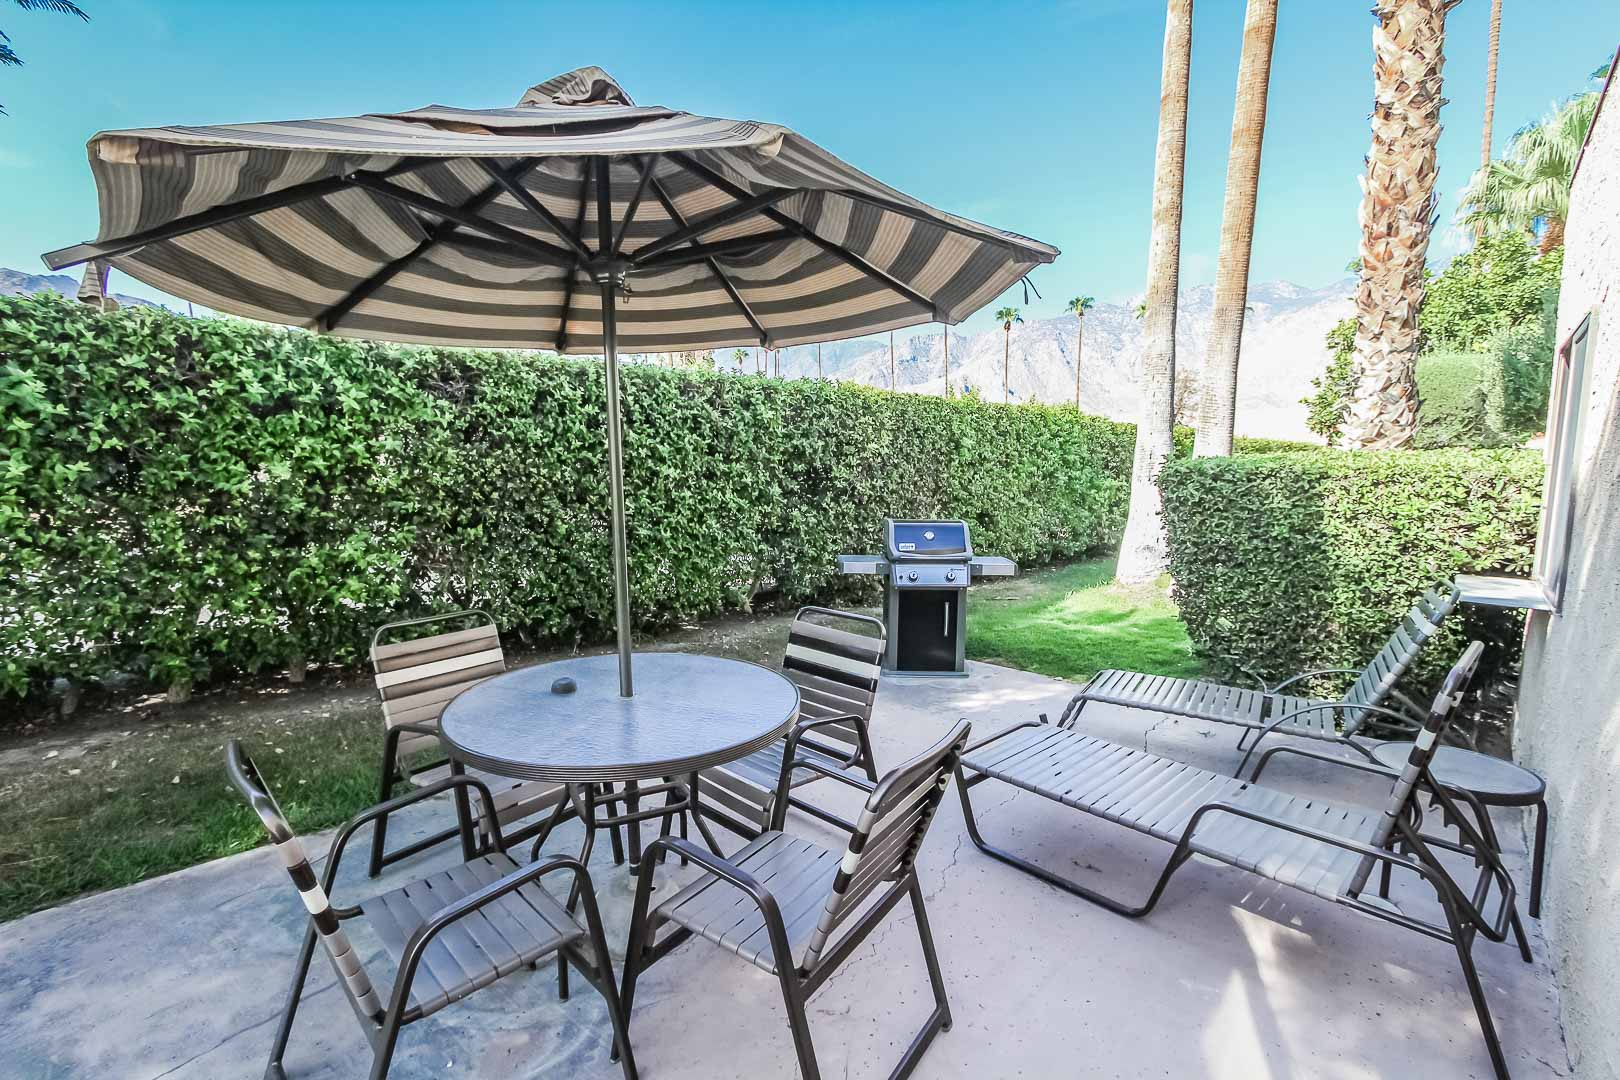 A spacious patio area at VRI's Desert Isle Resort in California.